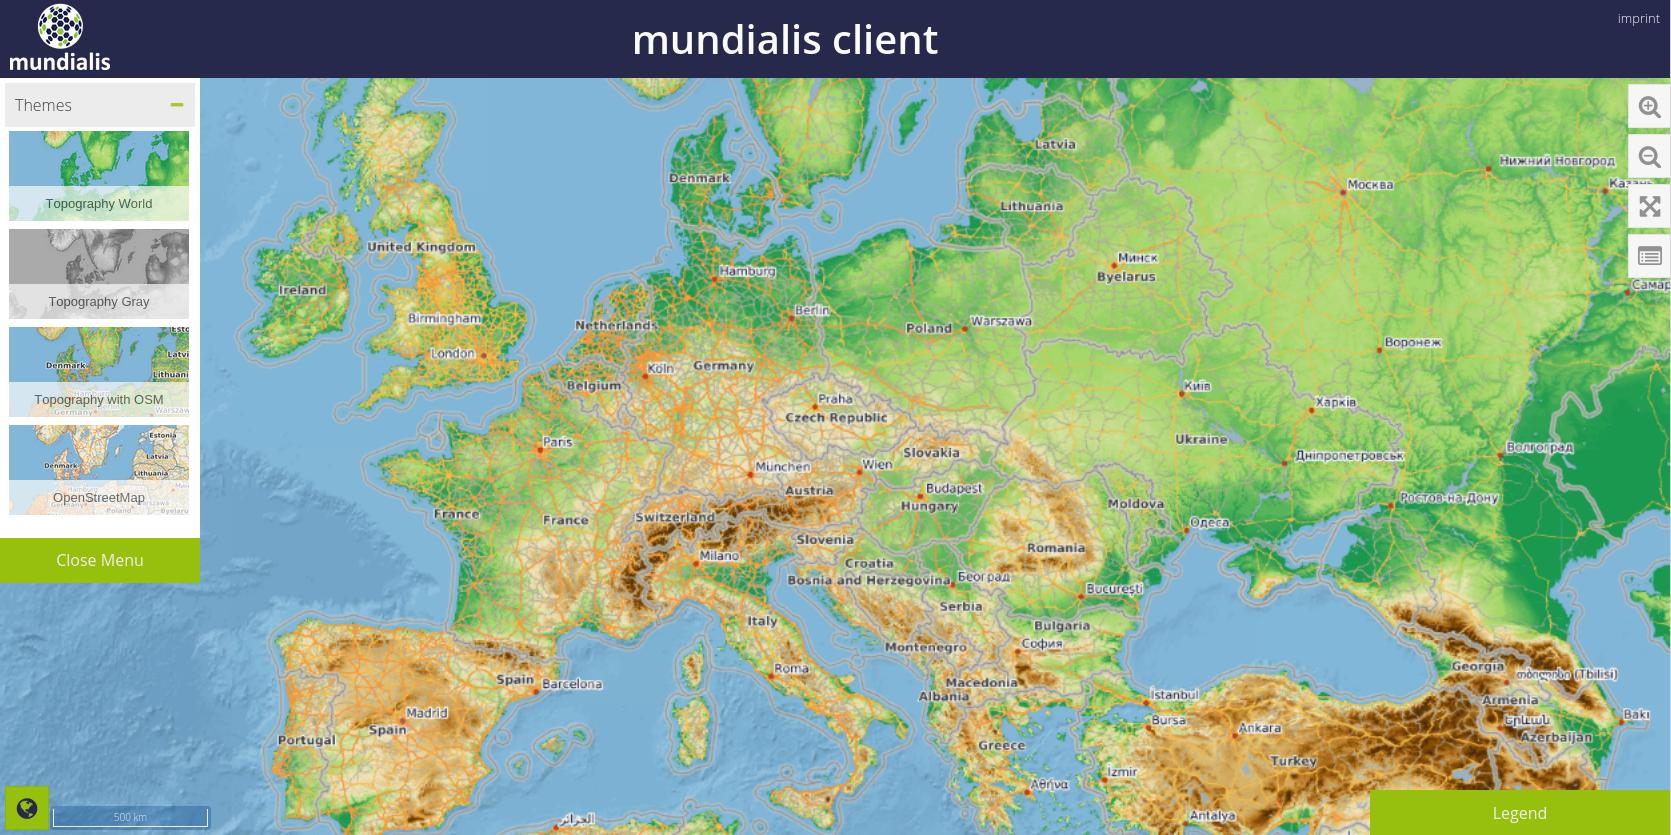 mundialisClient